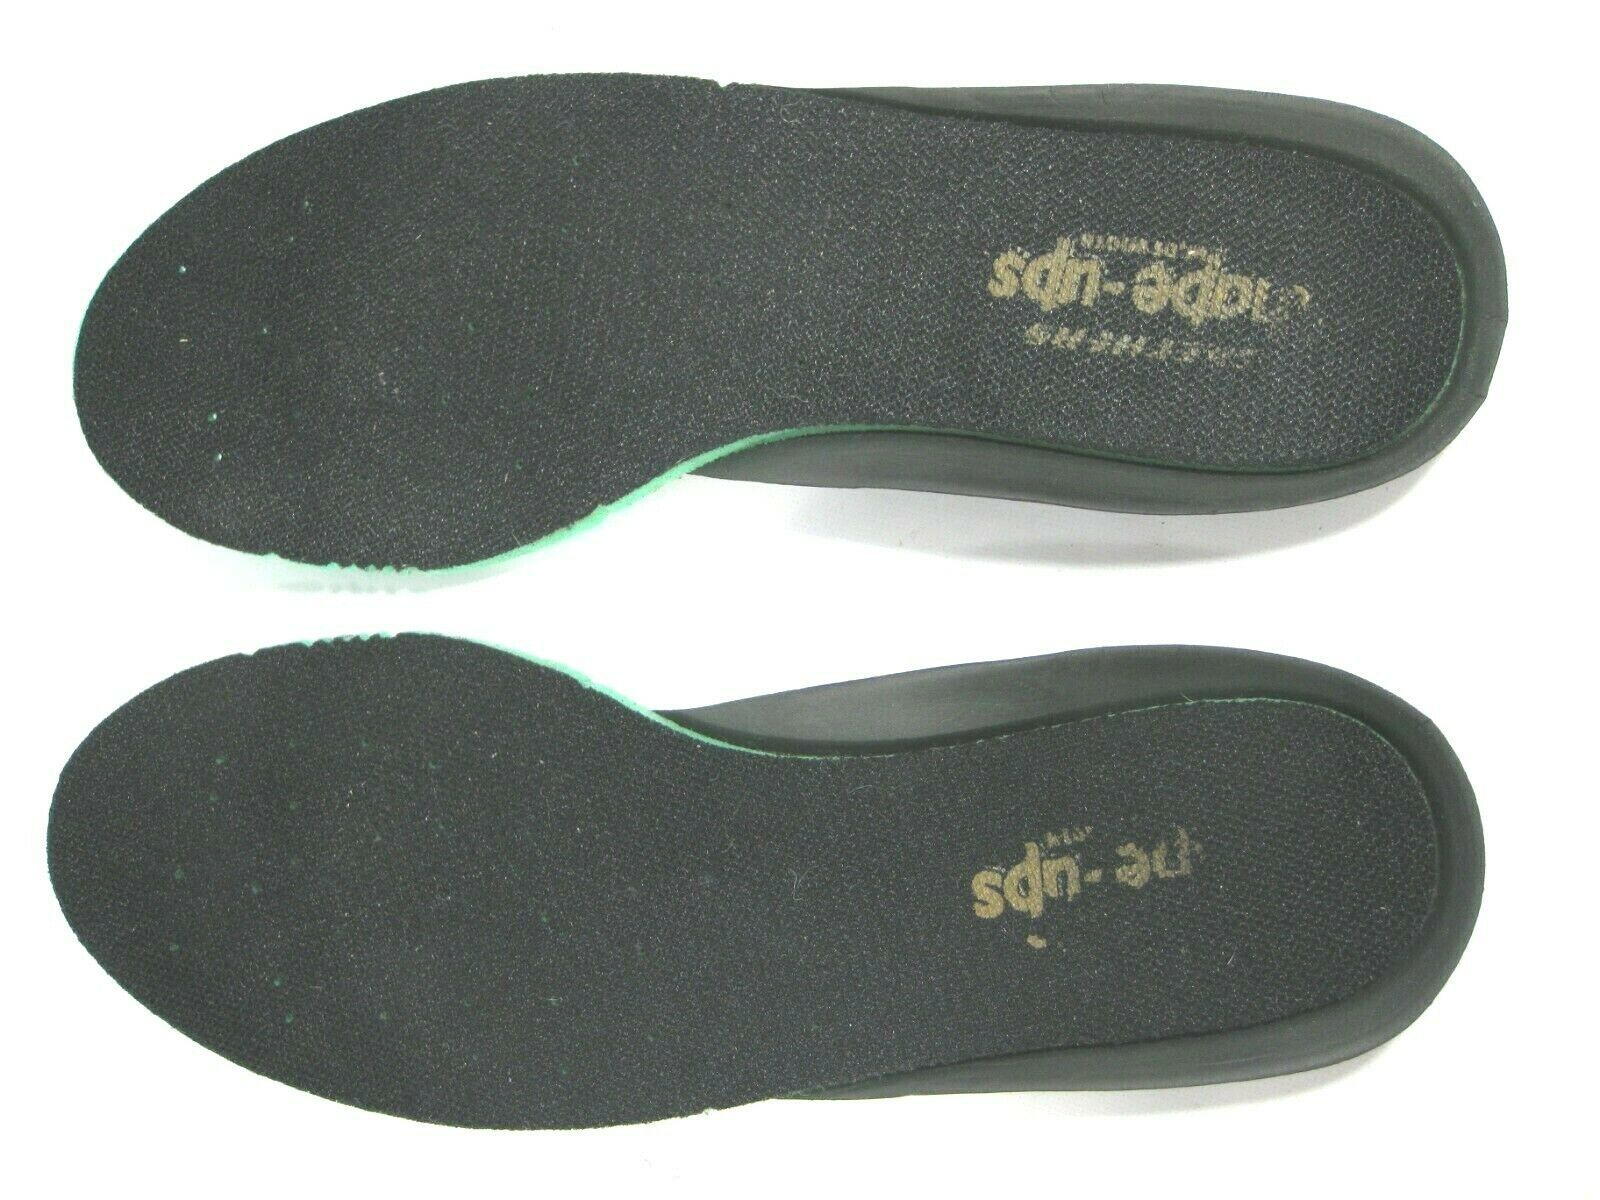 SKECHERS Shape Ups XT 52000EW Mens Athletic Walking Sneakers Shoes Size 9.5 PBL image 10